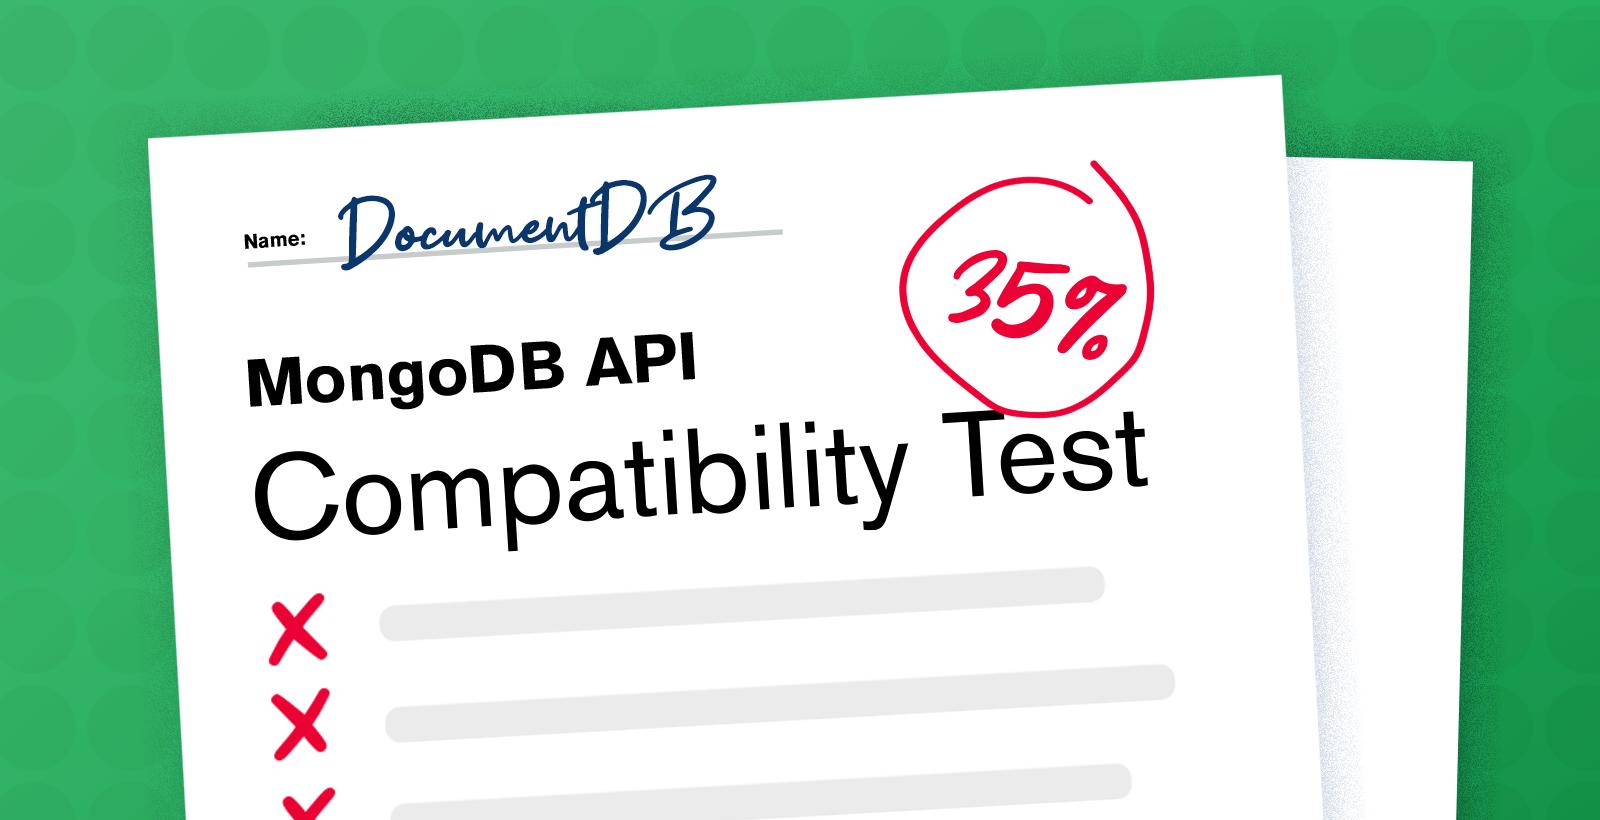 Compatibility Report Card